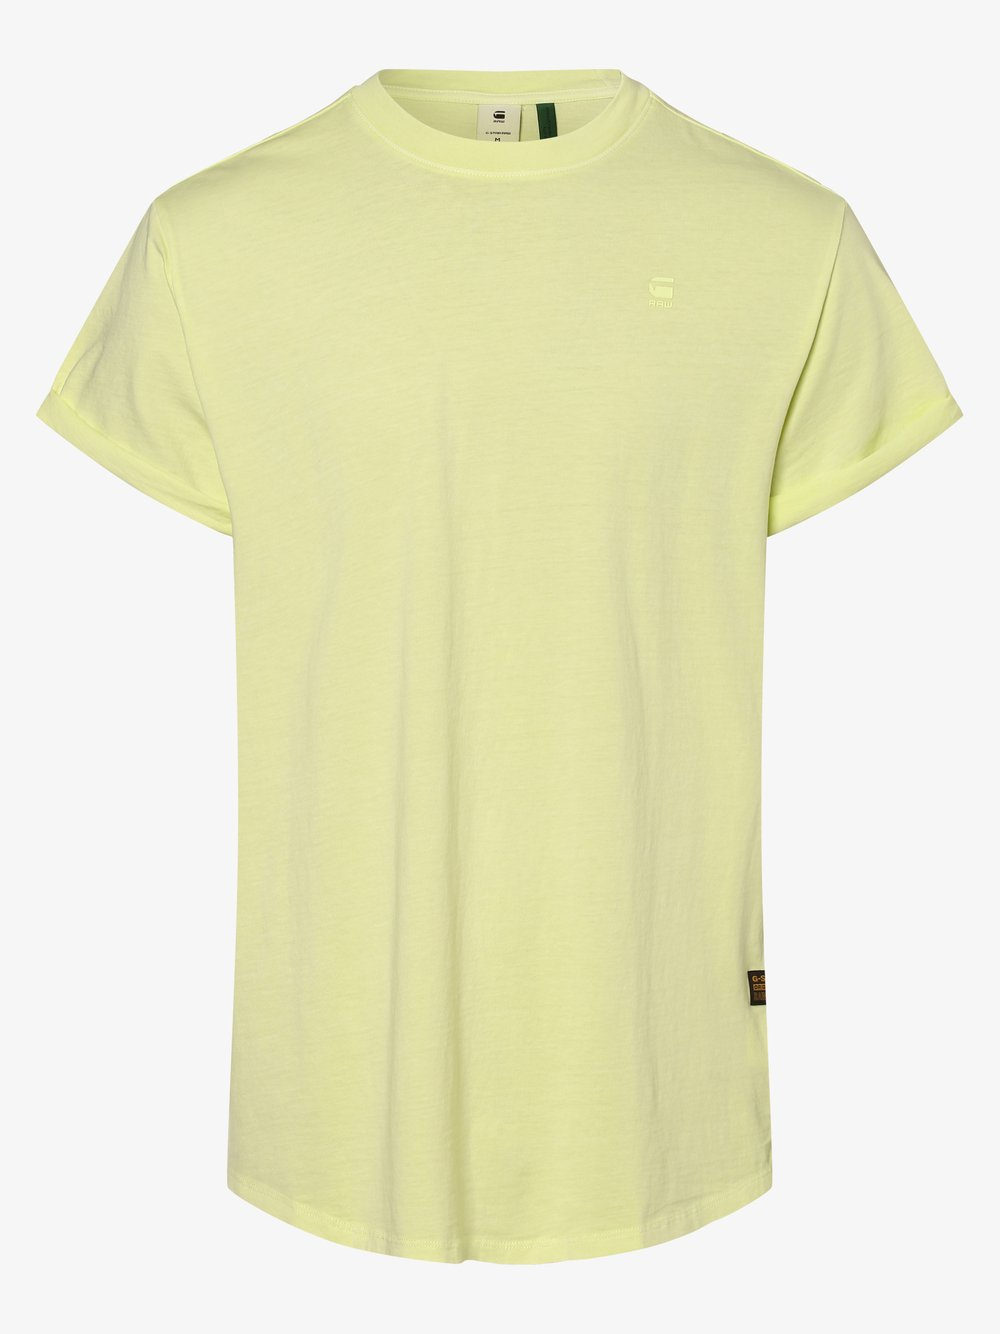 G-Star RAW - T-shirt męski, zielony